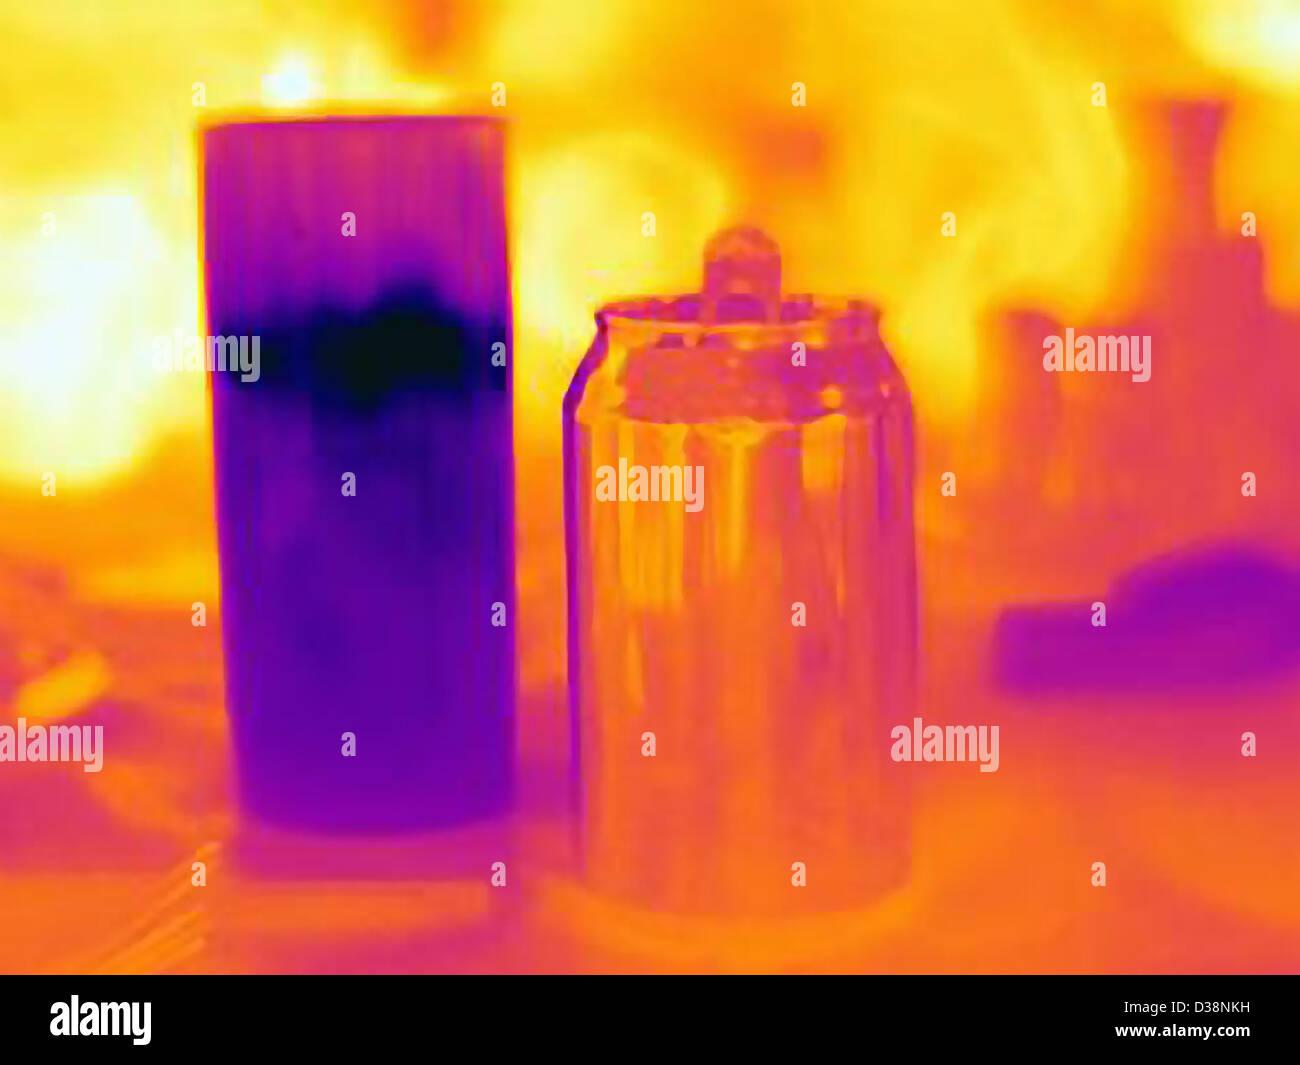 Immagine termica a lume di candela e può Immagini Stock